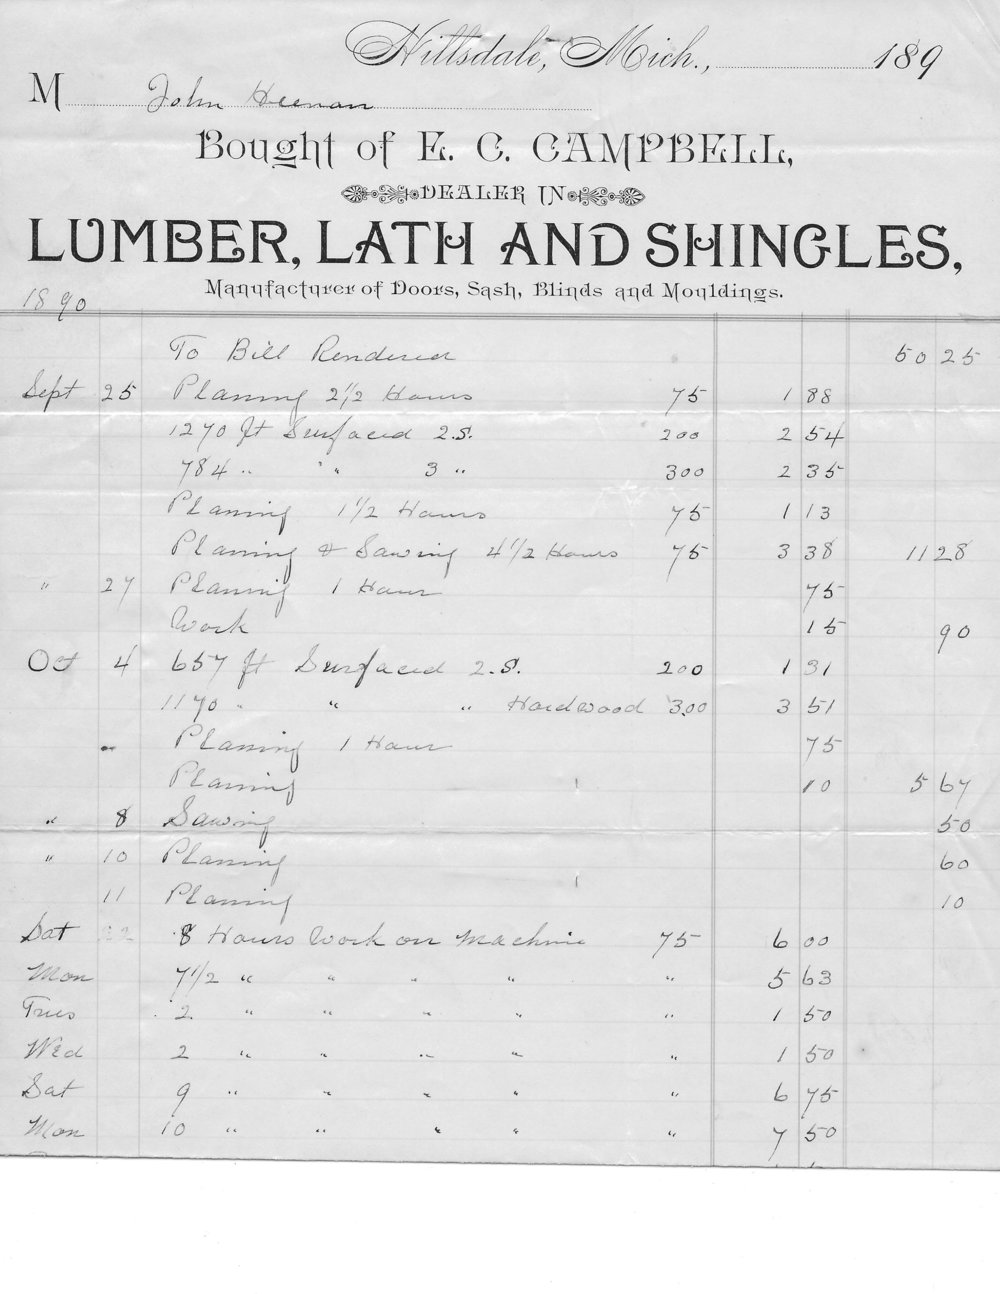 A receipt for materials 1890